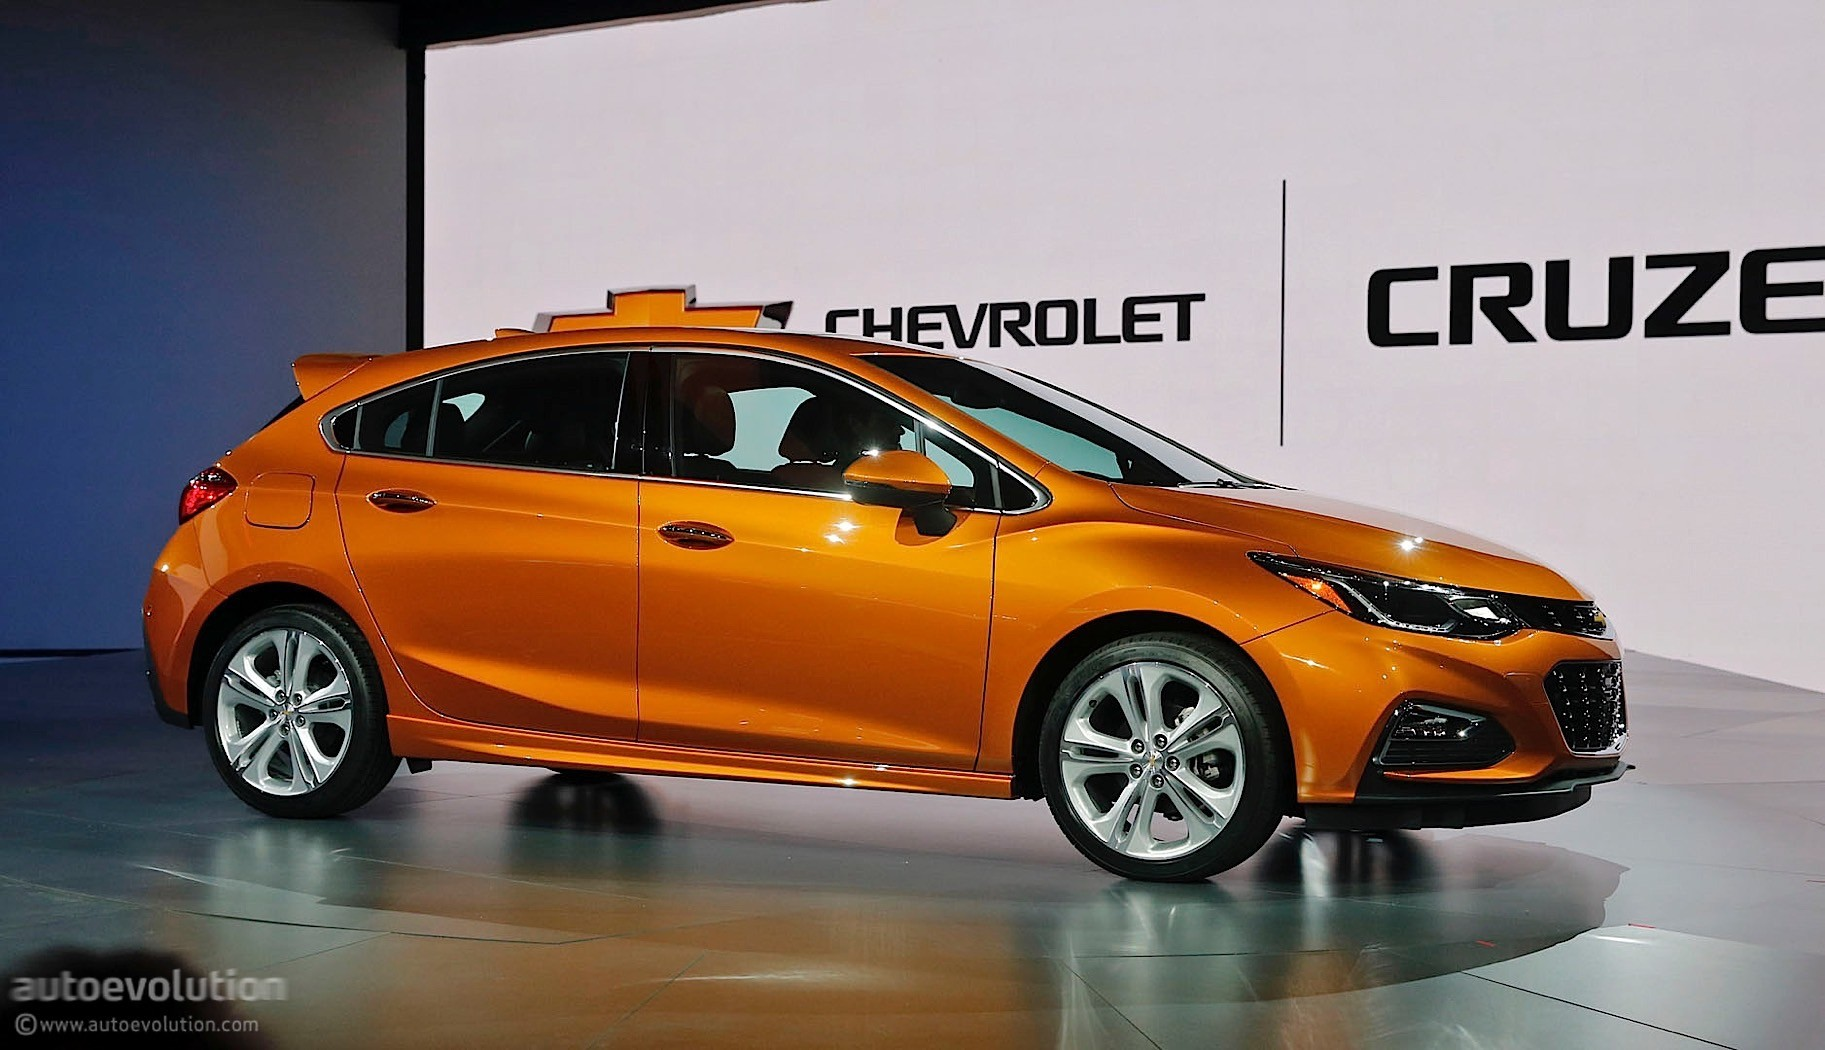 Chevy Cruze Diesel For Sale >> Chevrolet Cruze Diesel Developed With European Help